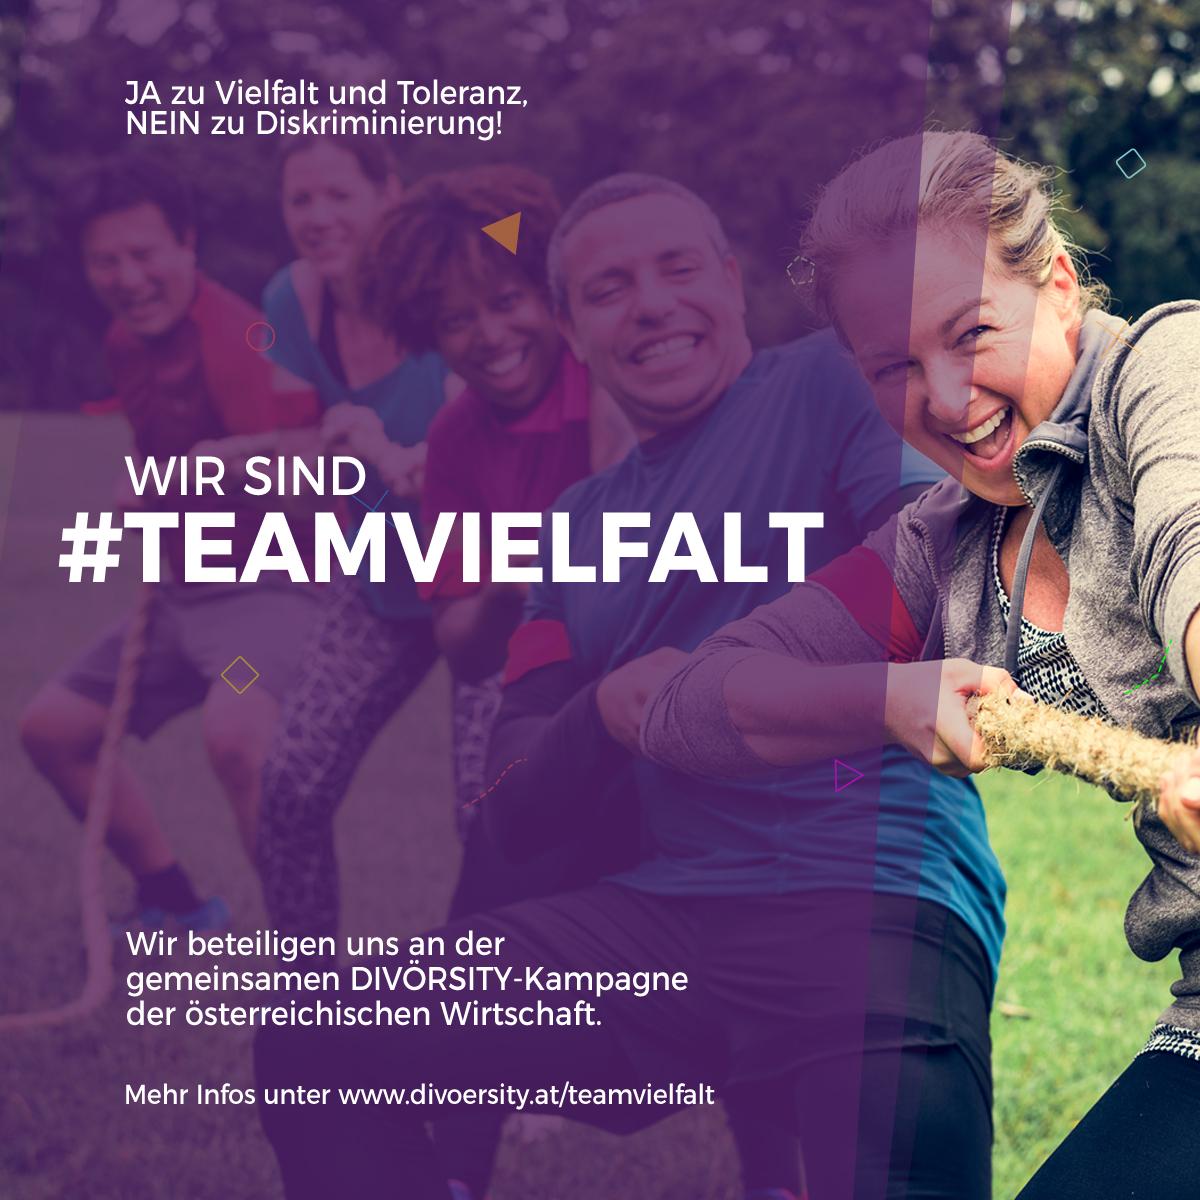 Social-Media-Kampagne #teamvielfalt